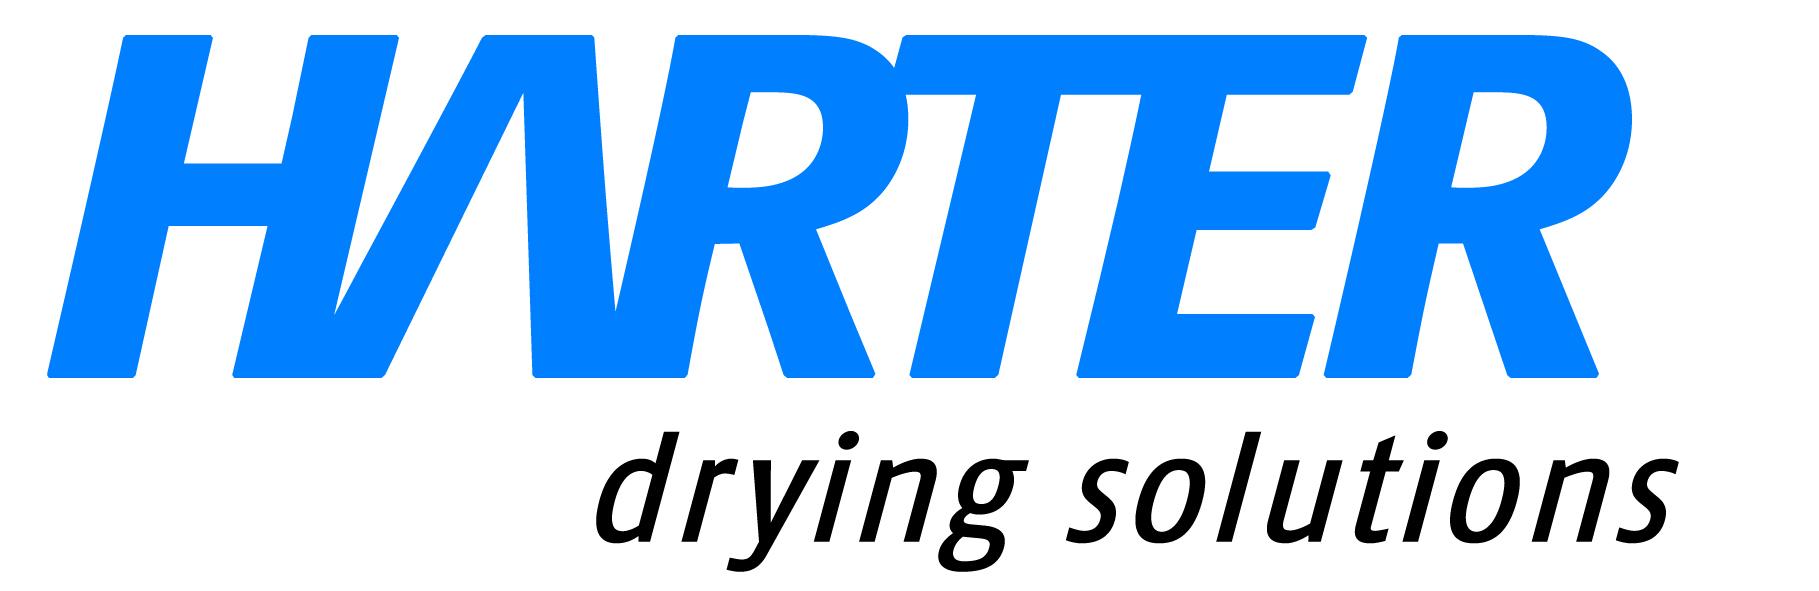 Harter-drying-solutions-Logo